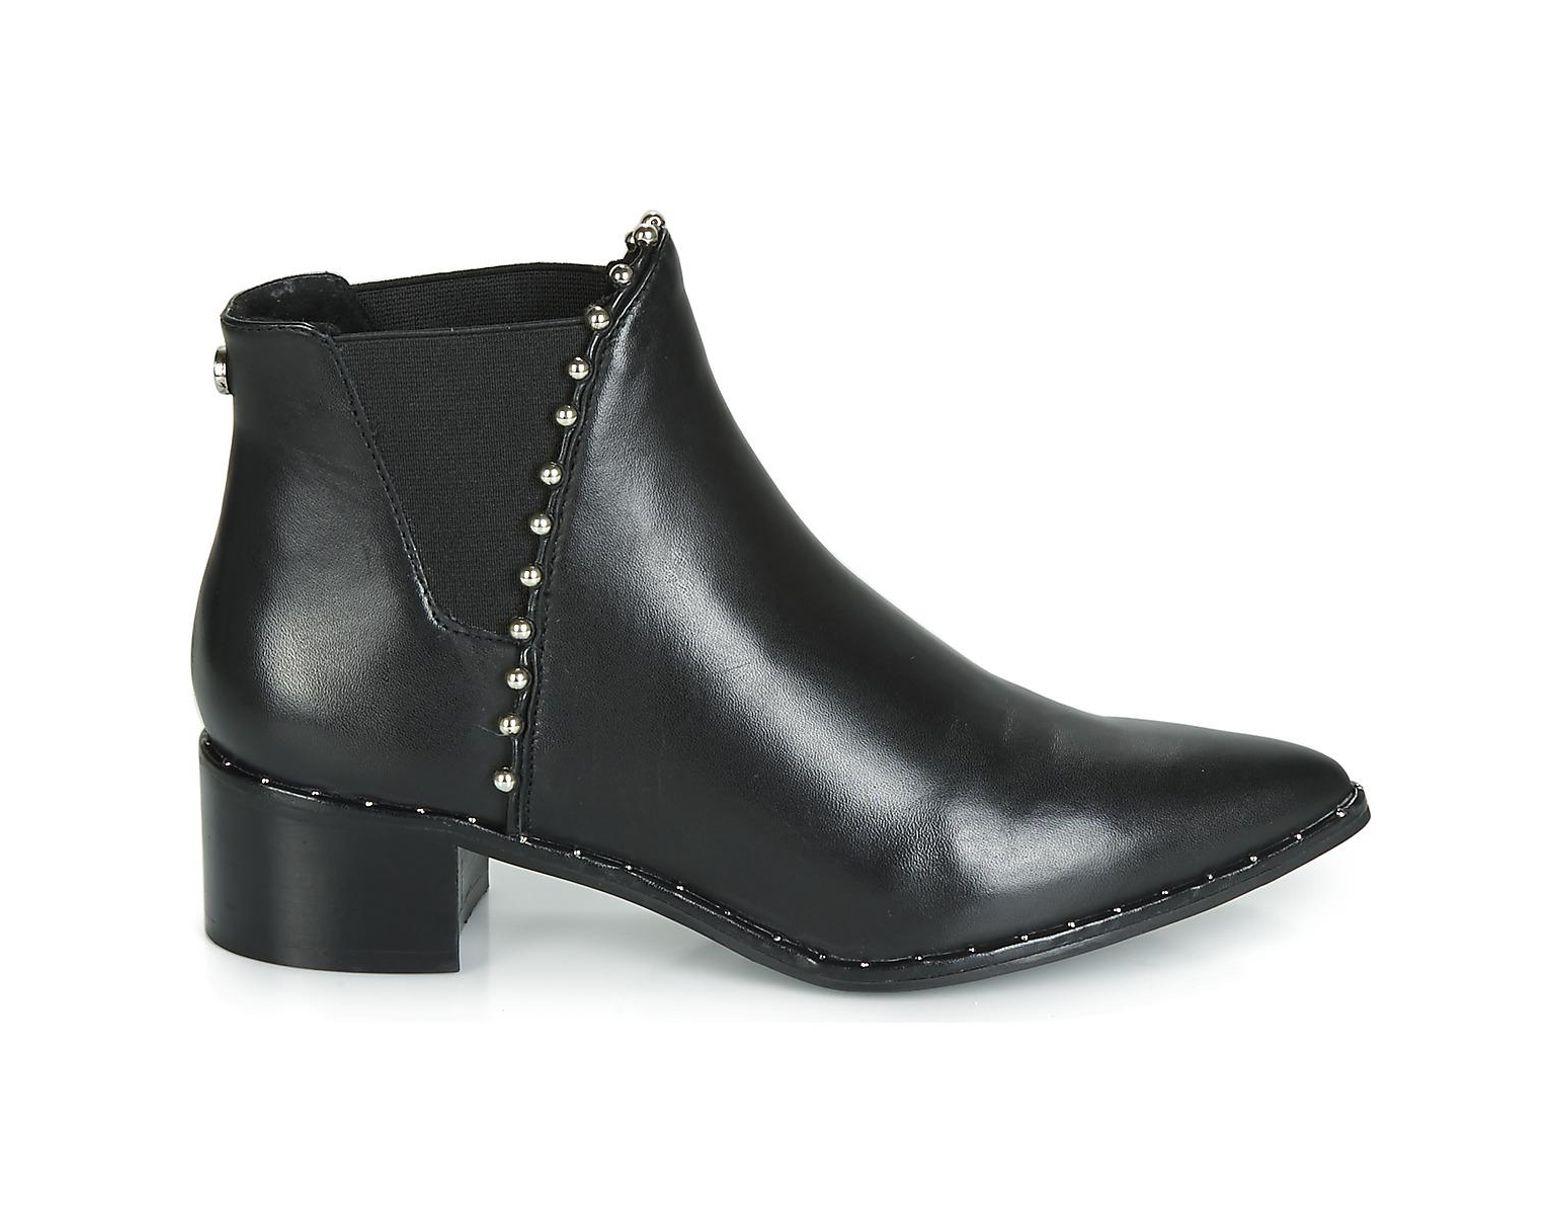 673975f5ef4 Black Floruss Women's Low Ankle Boots In Multicolour